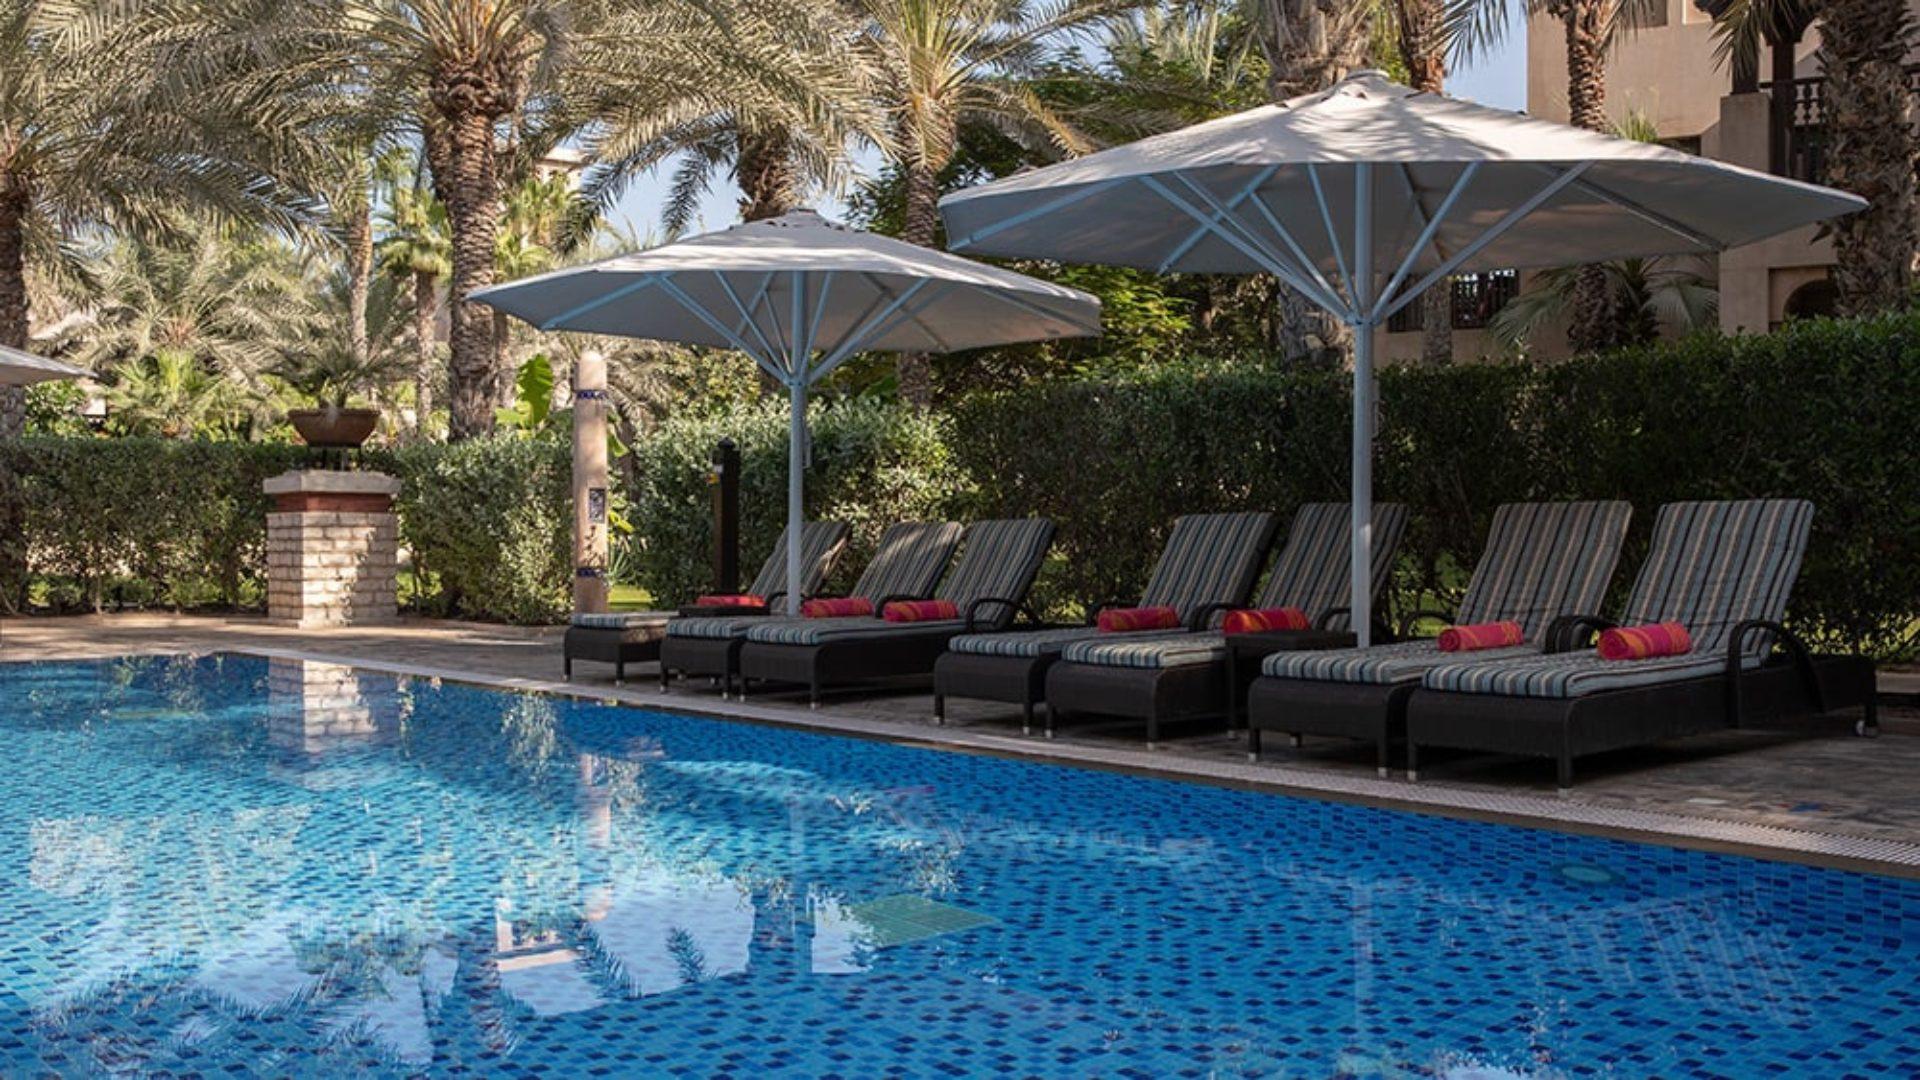 Shared pool with sun loungers at Jumeirah Dar Al Masyaf